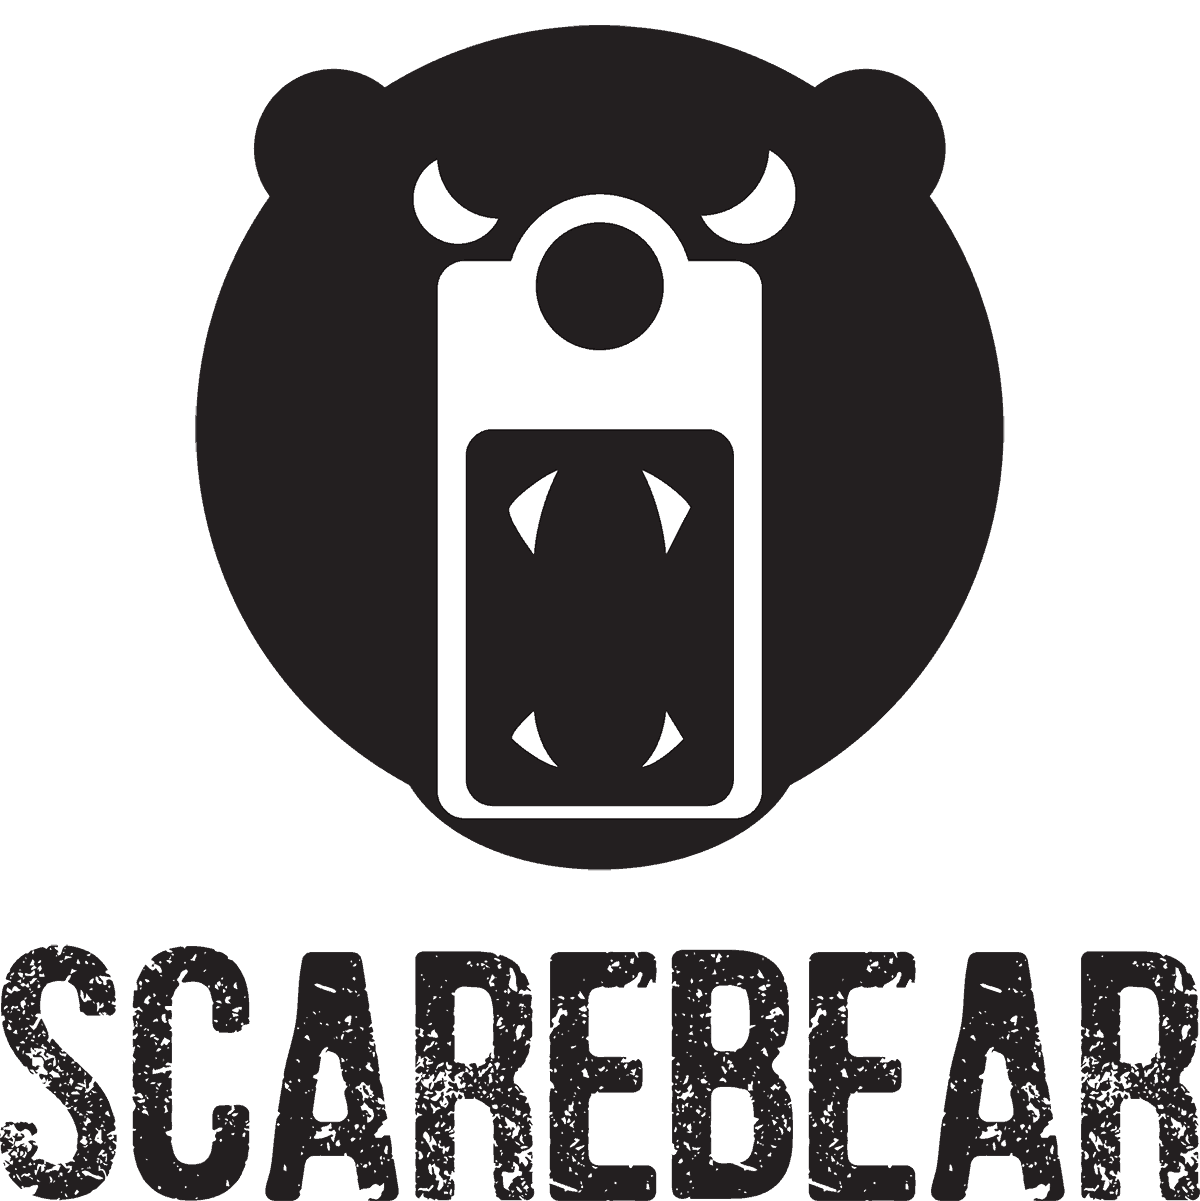 Scarebear